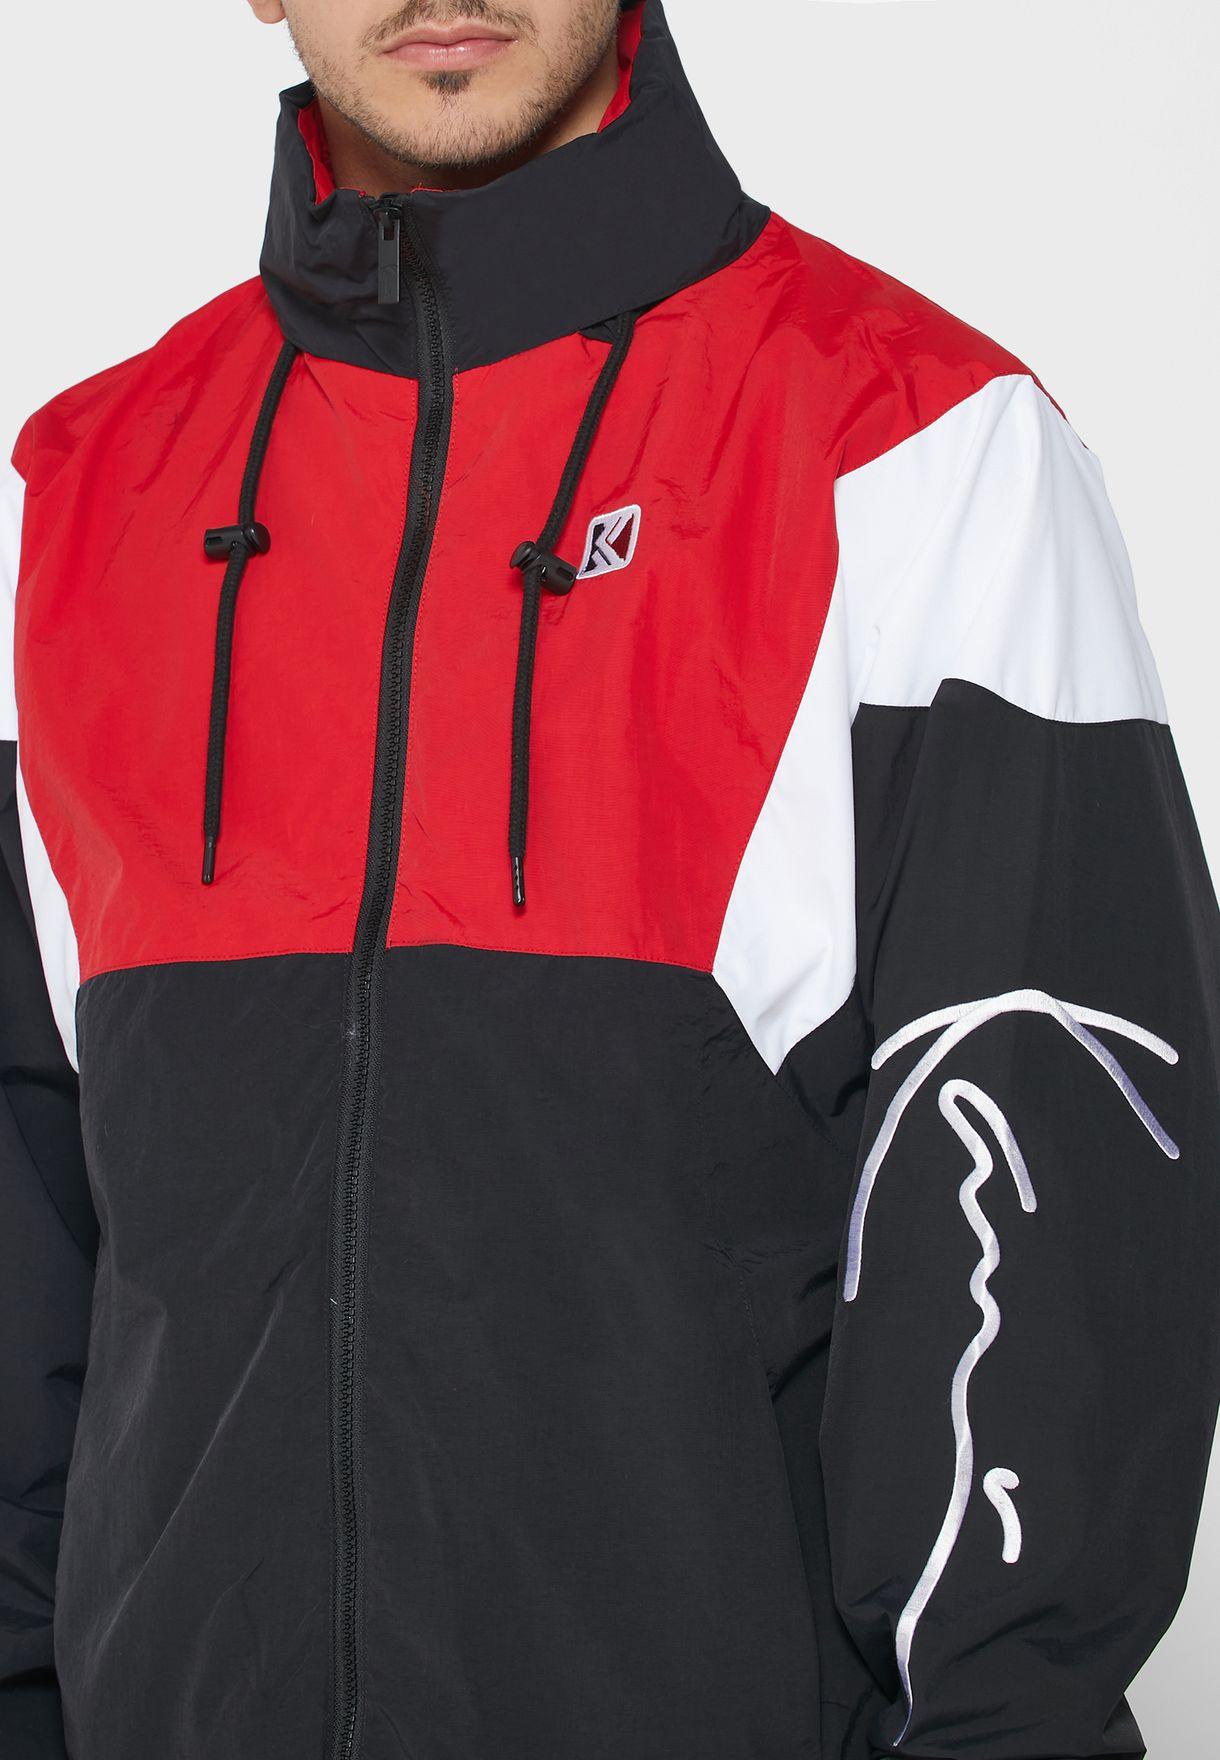 Retro Colour Block Track Jacket